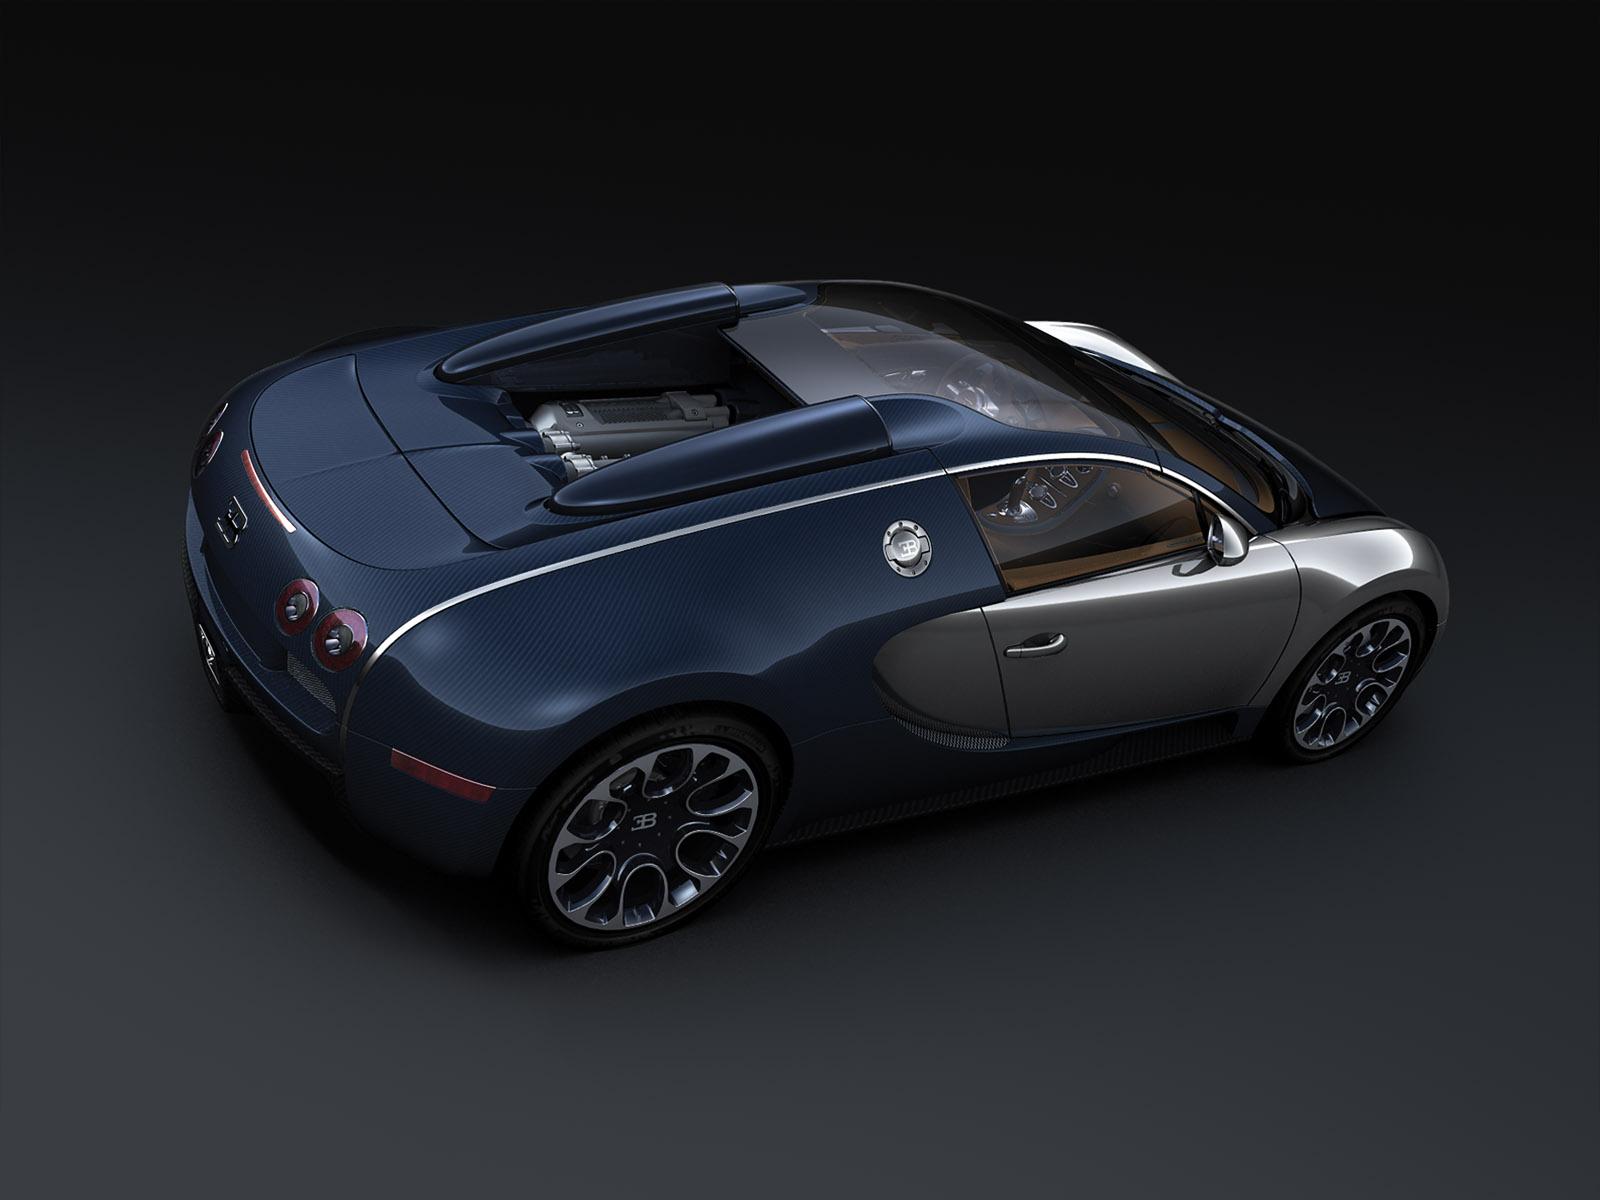 bugatti-sang-bleu-grand-sport-revealed_1 Gorgeous Bugatti Veyron Grand Sport Vitesse Bleu Cars Trend